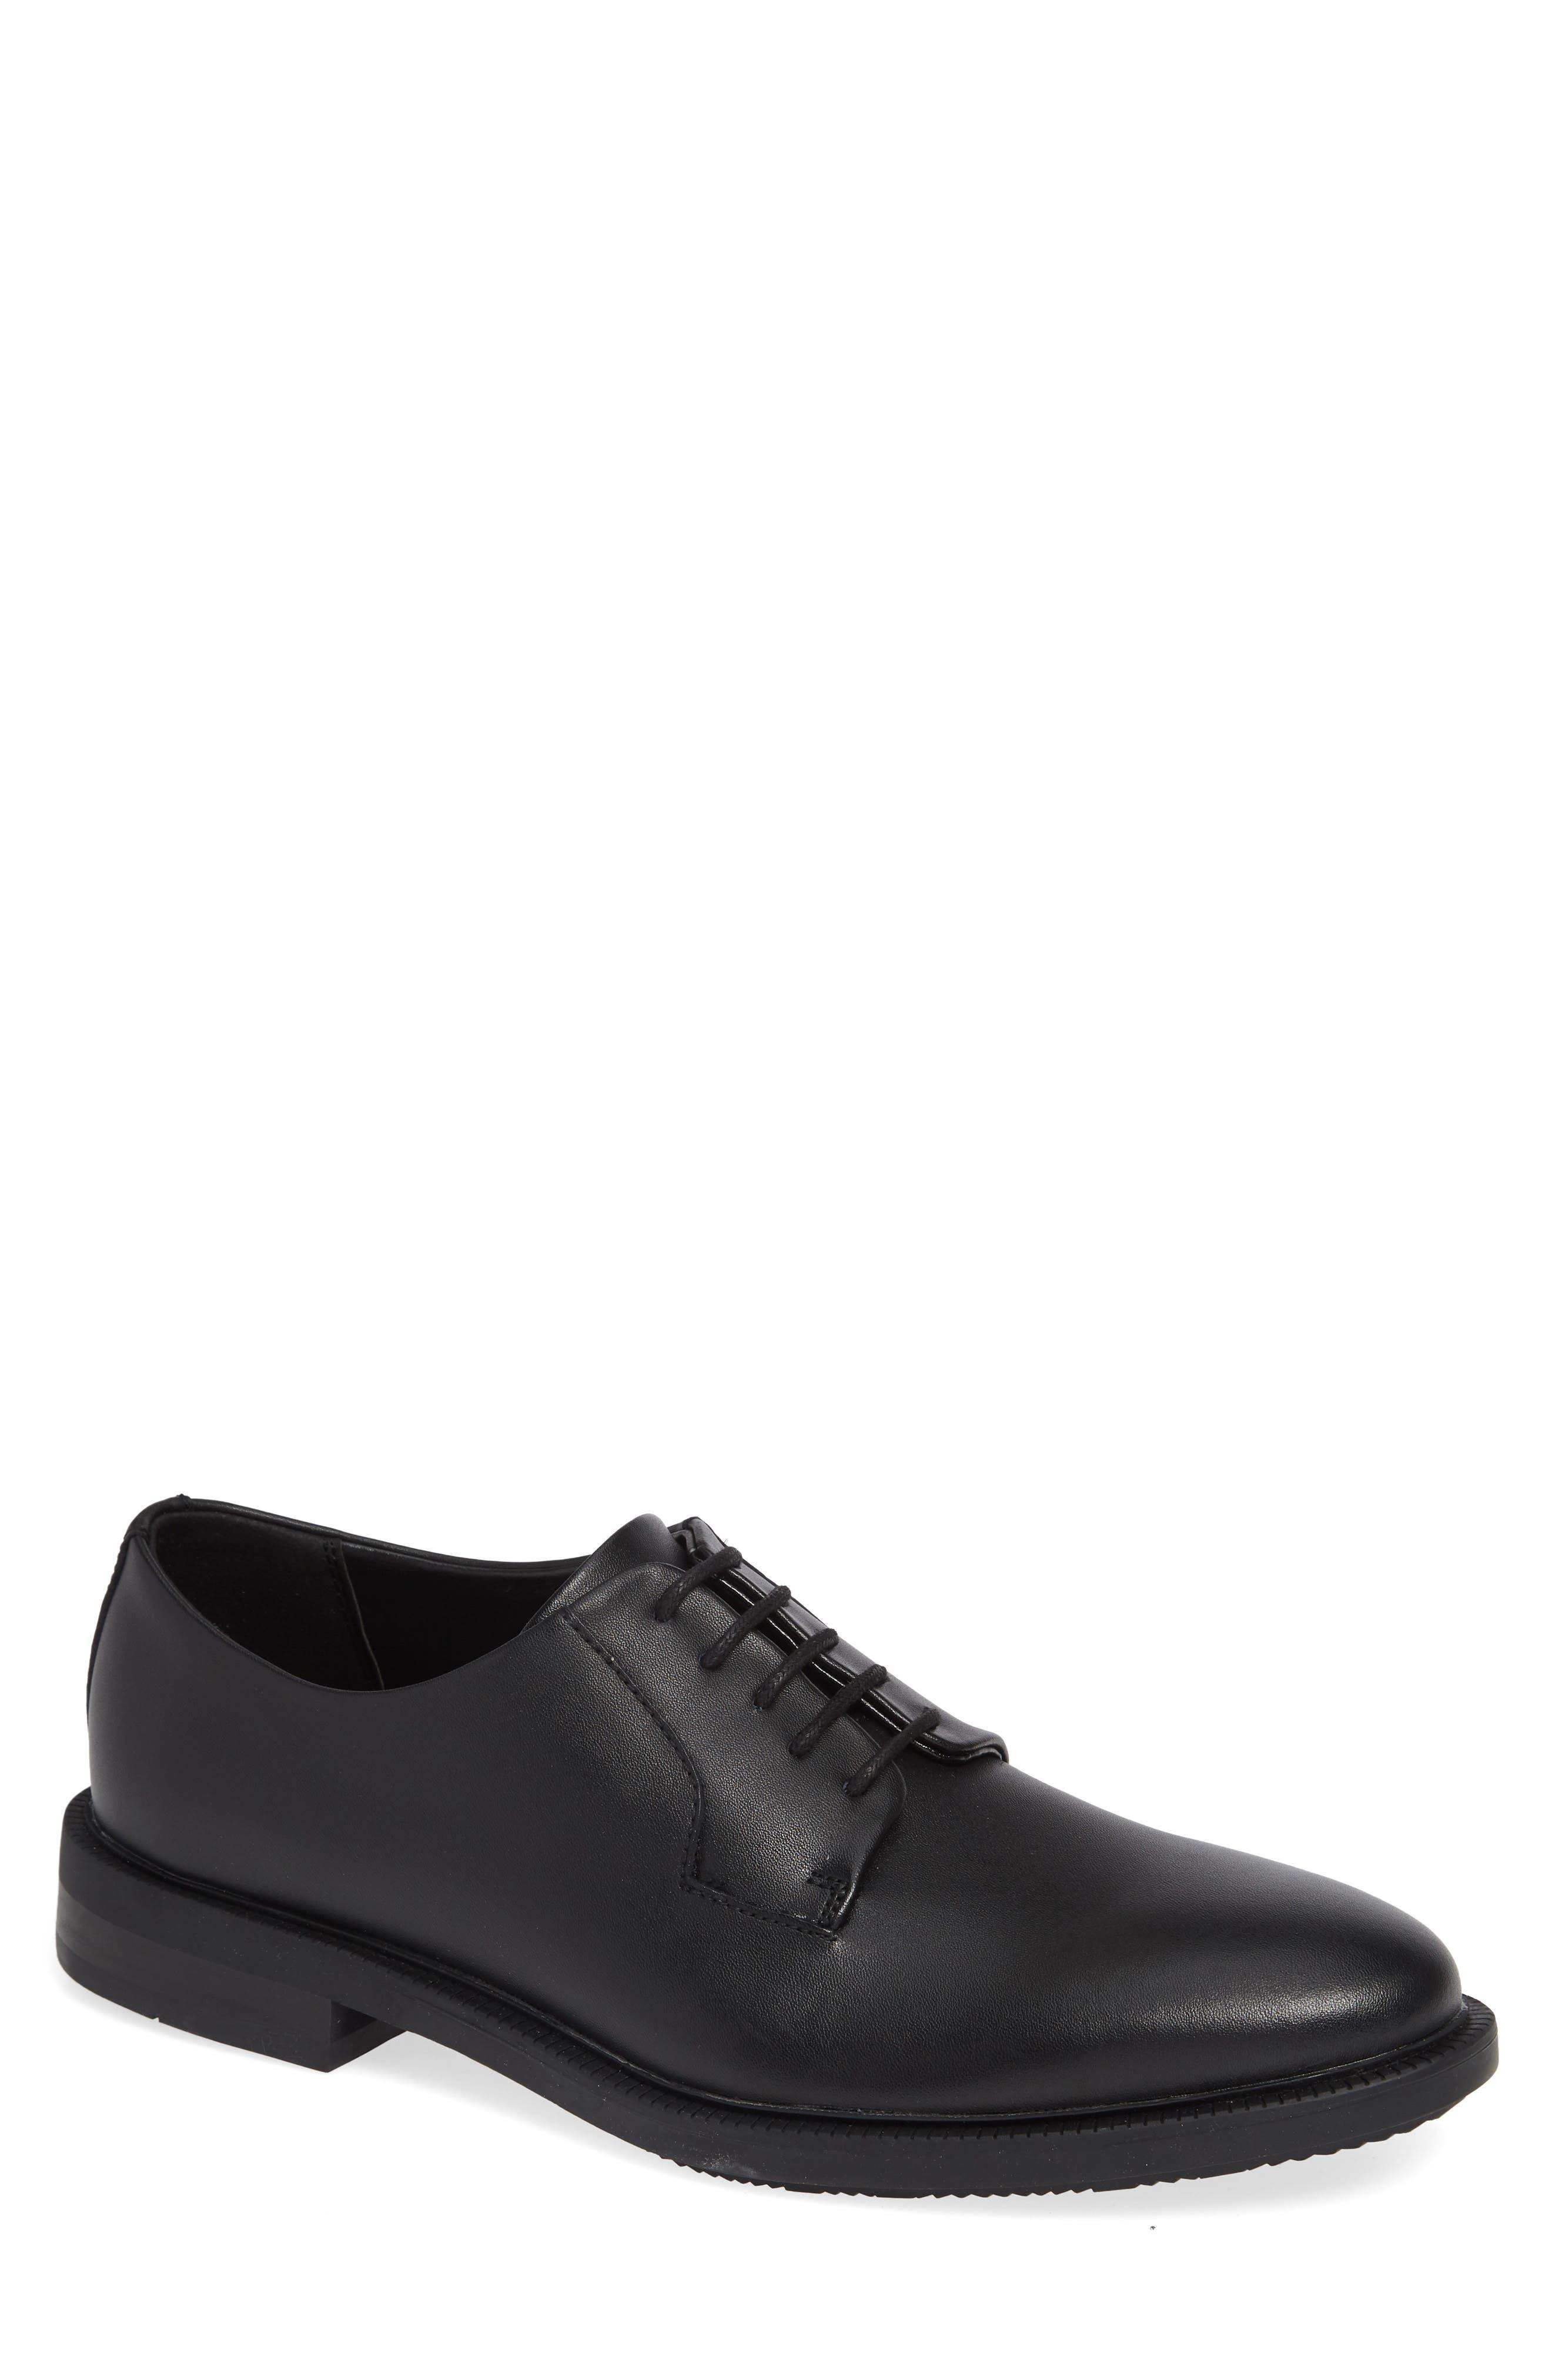 Carl Plain Toe Derby,                         Main,                         color, BLACK LEATHER